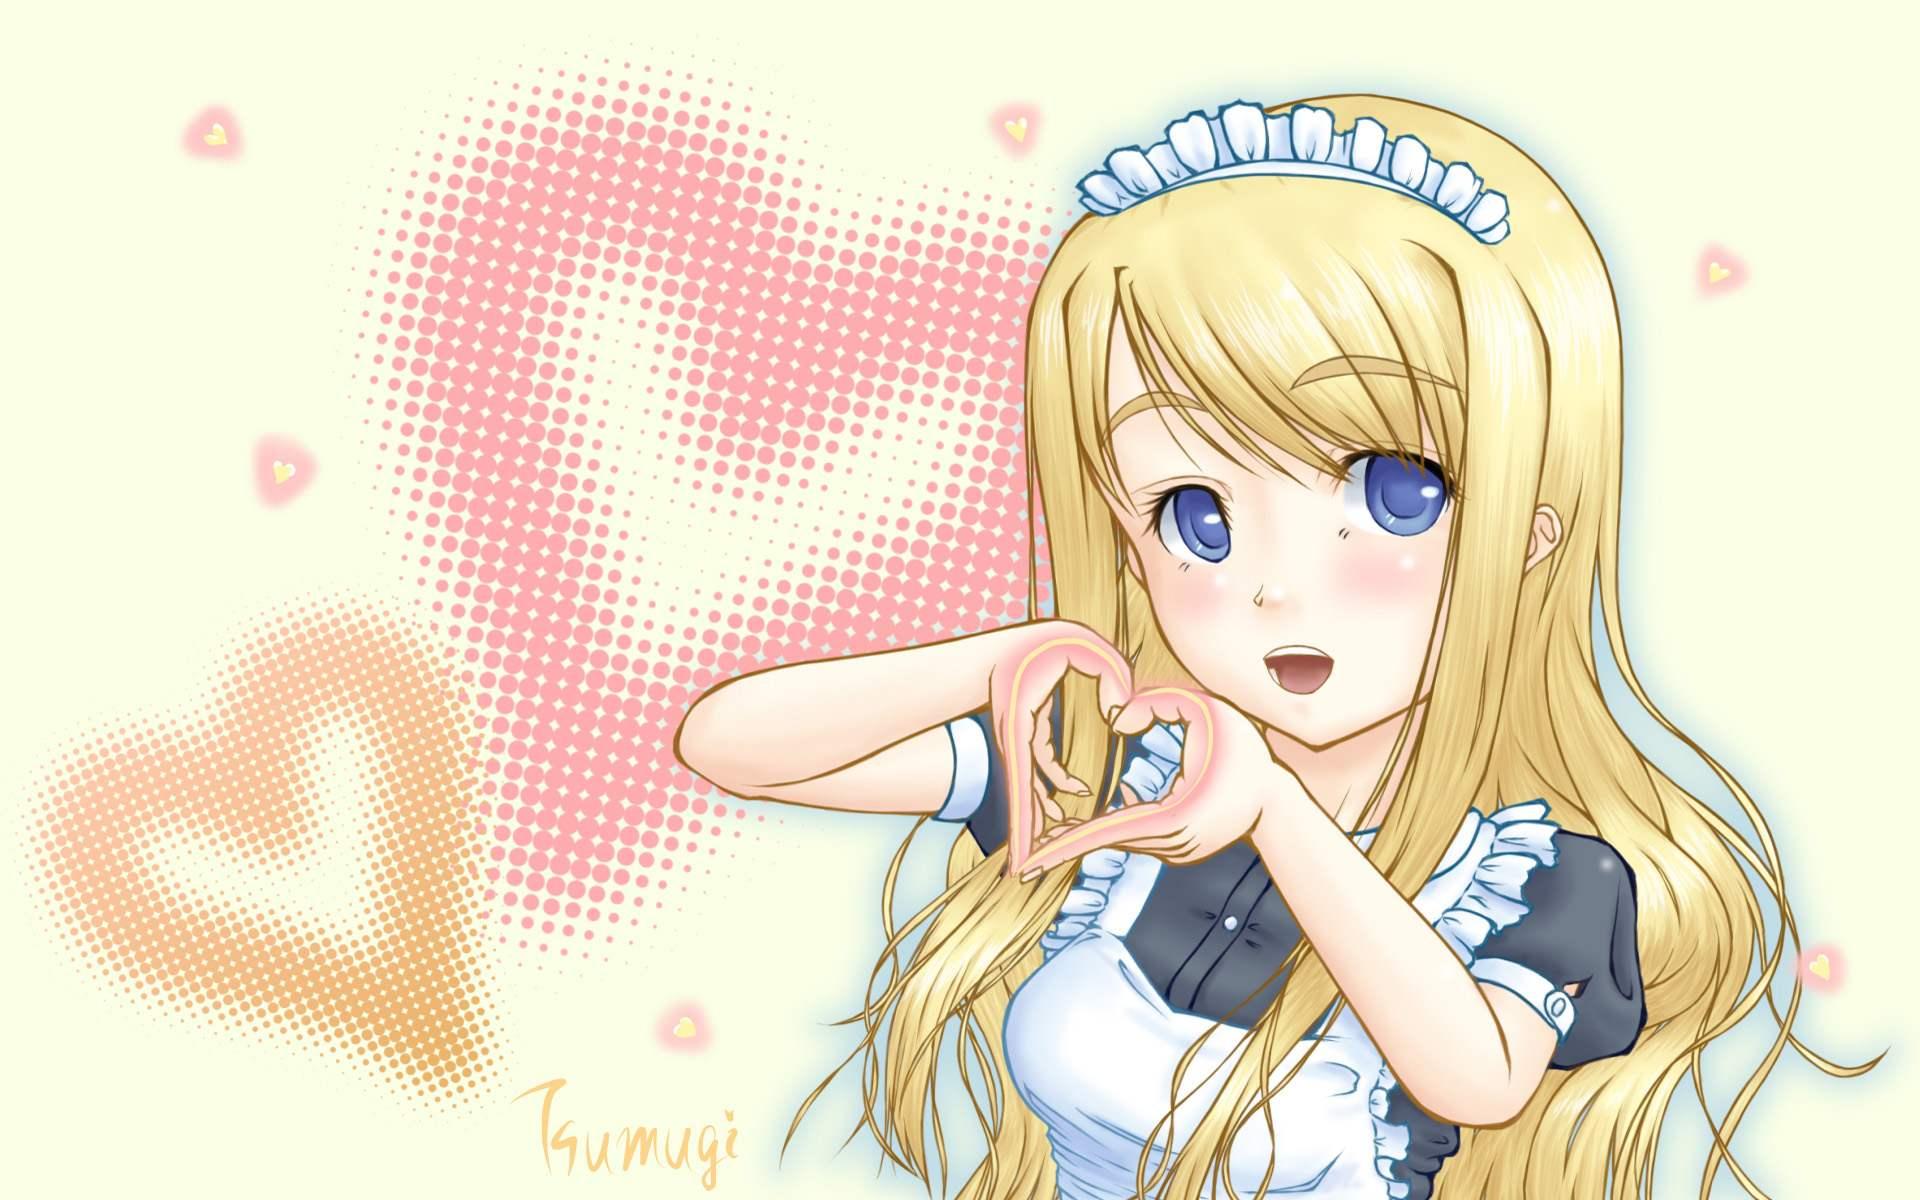 76 Cute Anime Backgrounds On Wallpapersafari